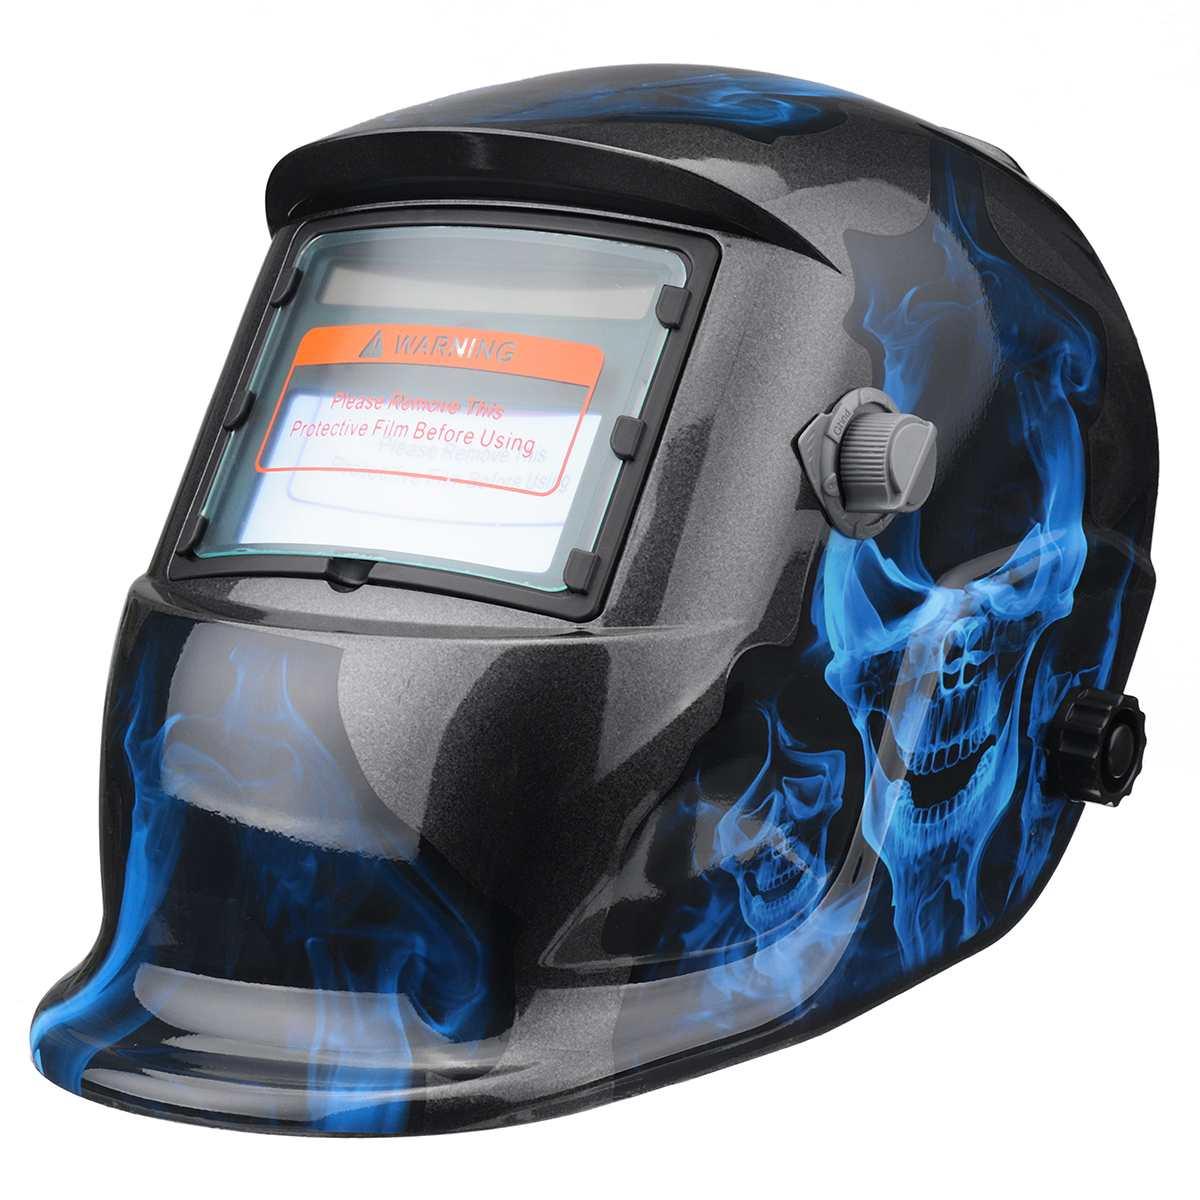 Automatic Darkening Welding Mask TIG MIG MMA MAG KR KC Electric Welding Mask/Helmet/Welder For Welding Machine